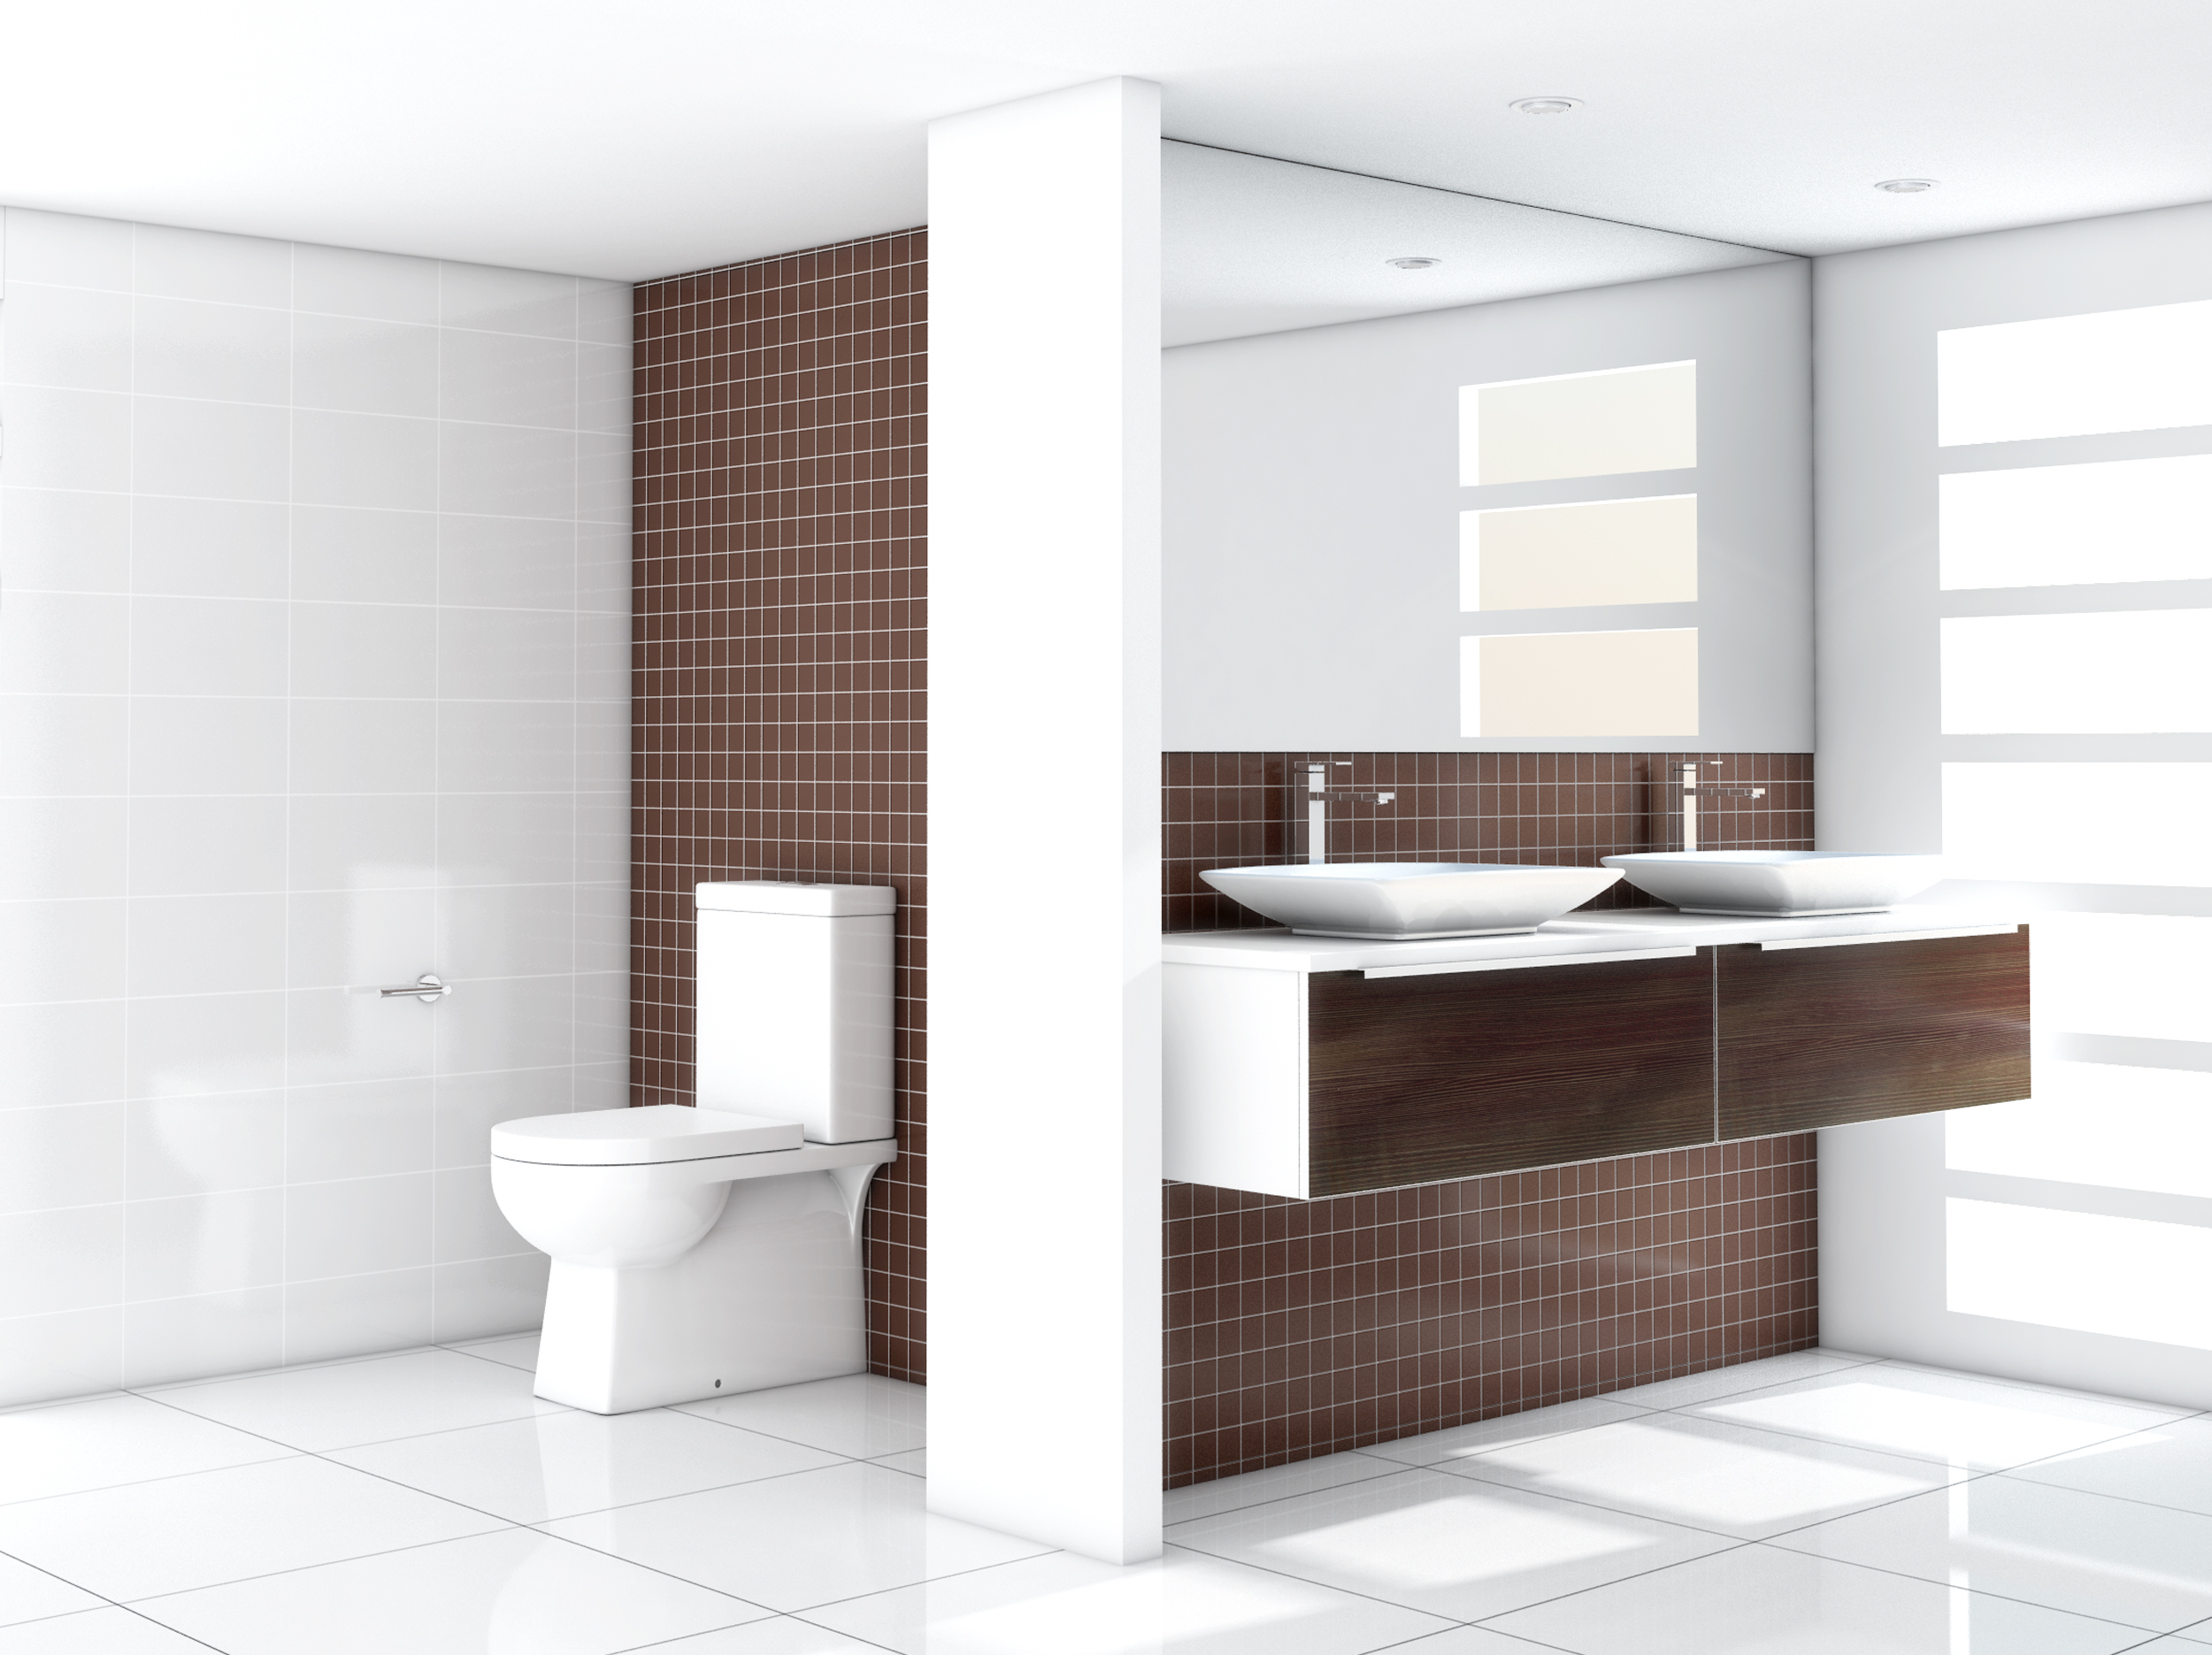 Bathroom Renovation Ideas 2015